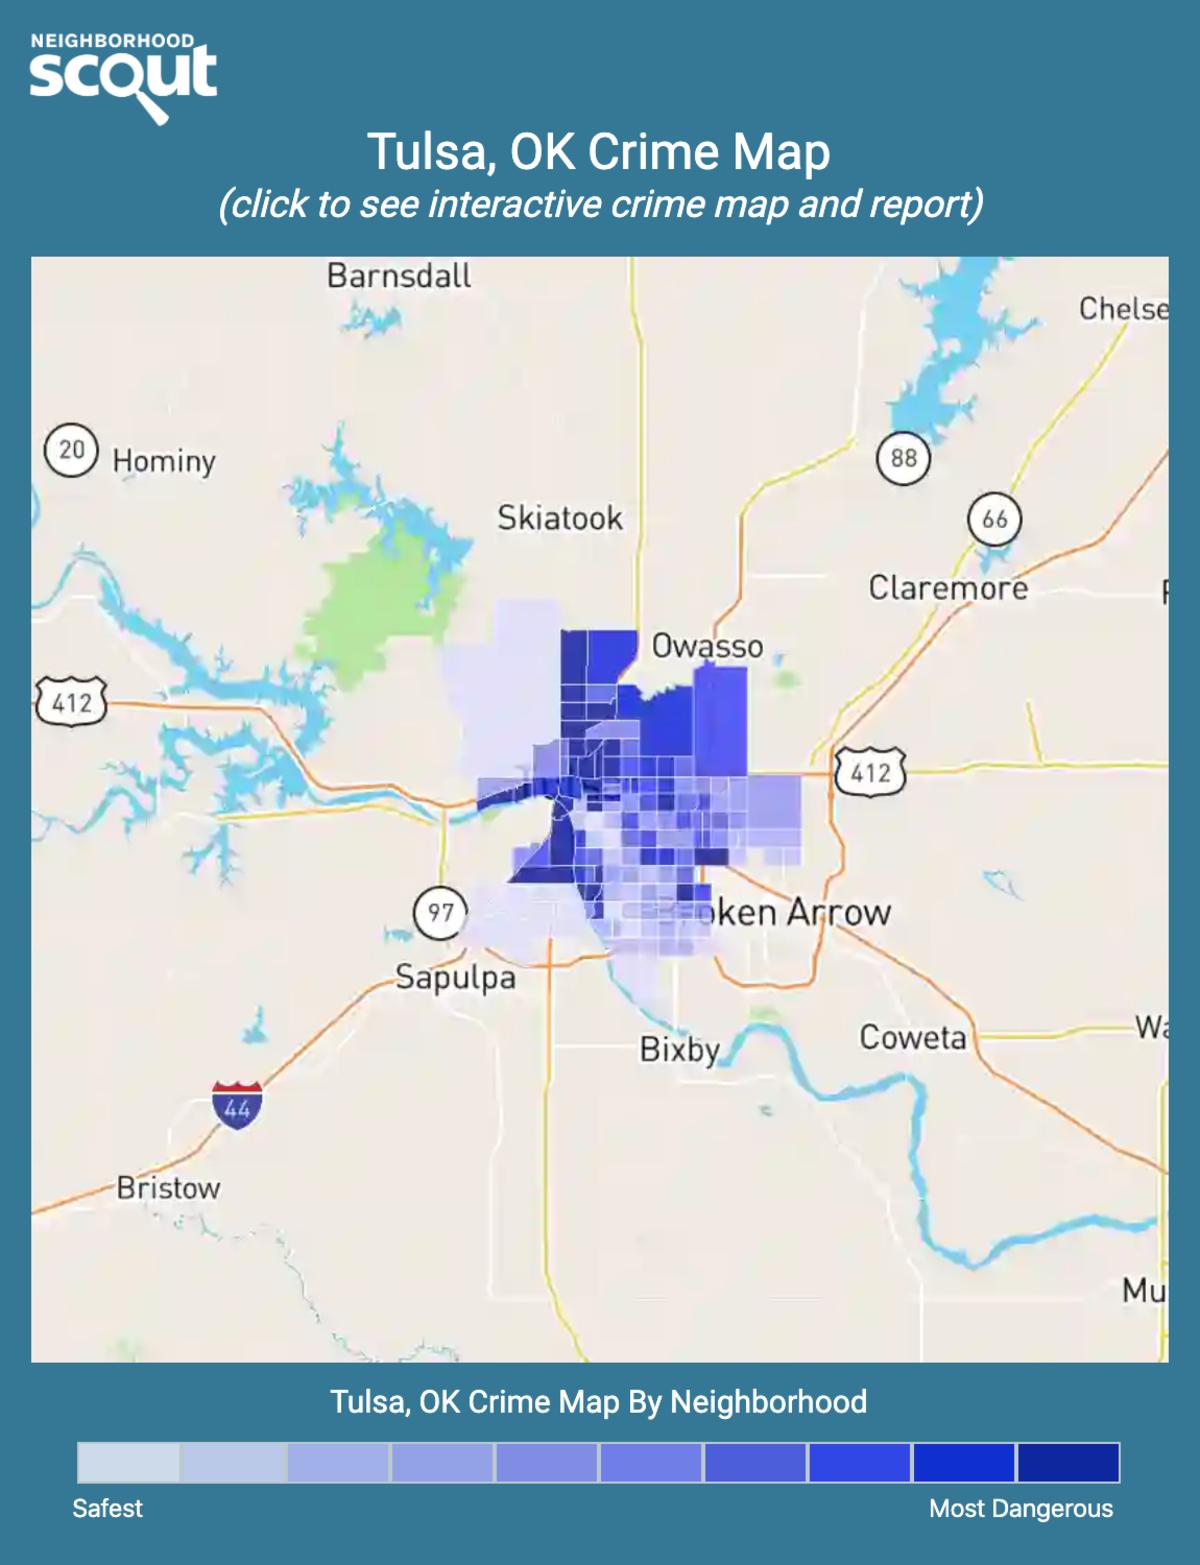 Tulsa, Oklahoma crime map